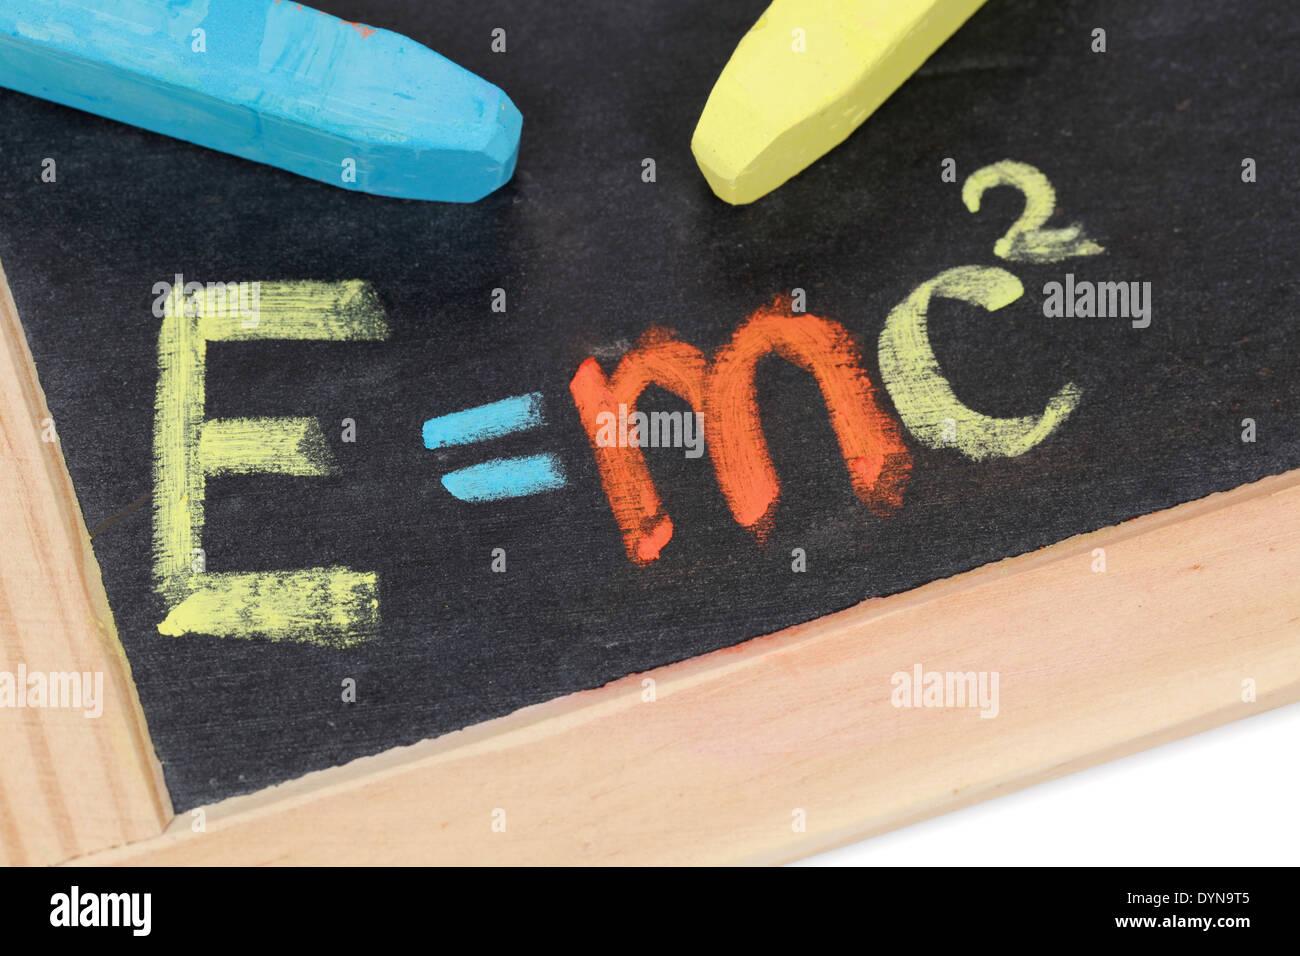 The formula E=mc2 on a blackboard at school - Stock Image